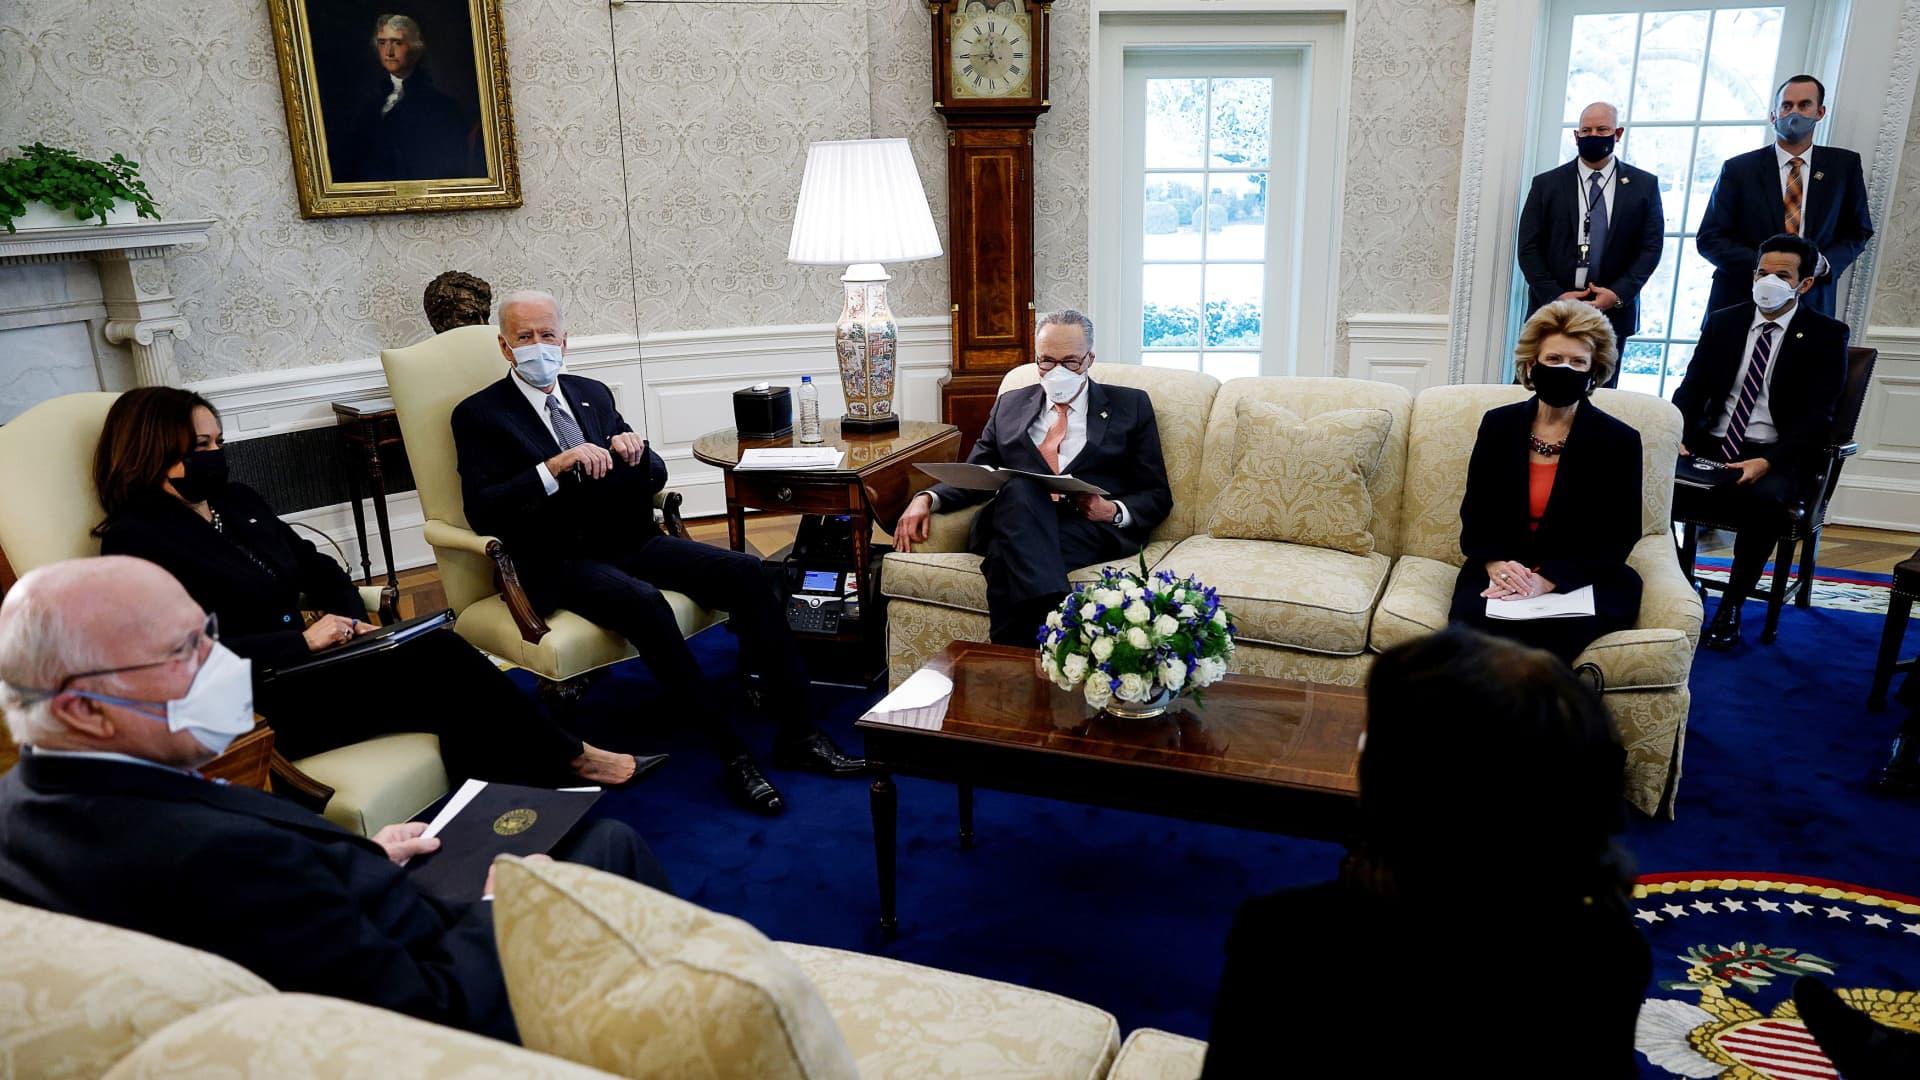 President Joe Biden and Vice President Kamala Harris discuss coronavirus aid legislation with Democratic senators during a meeting in the Oval Office at the White House in Washington, U.S., February 3, 2021.